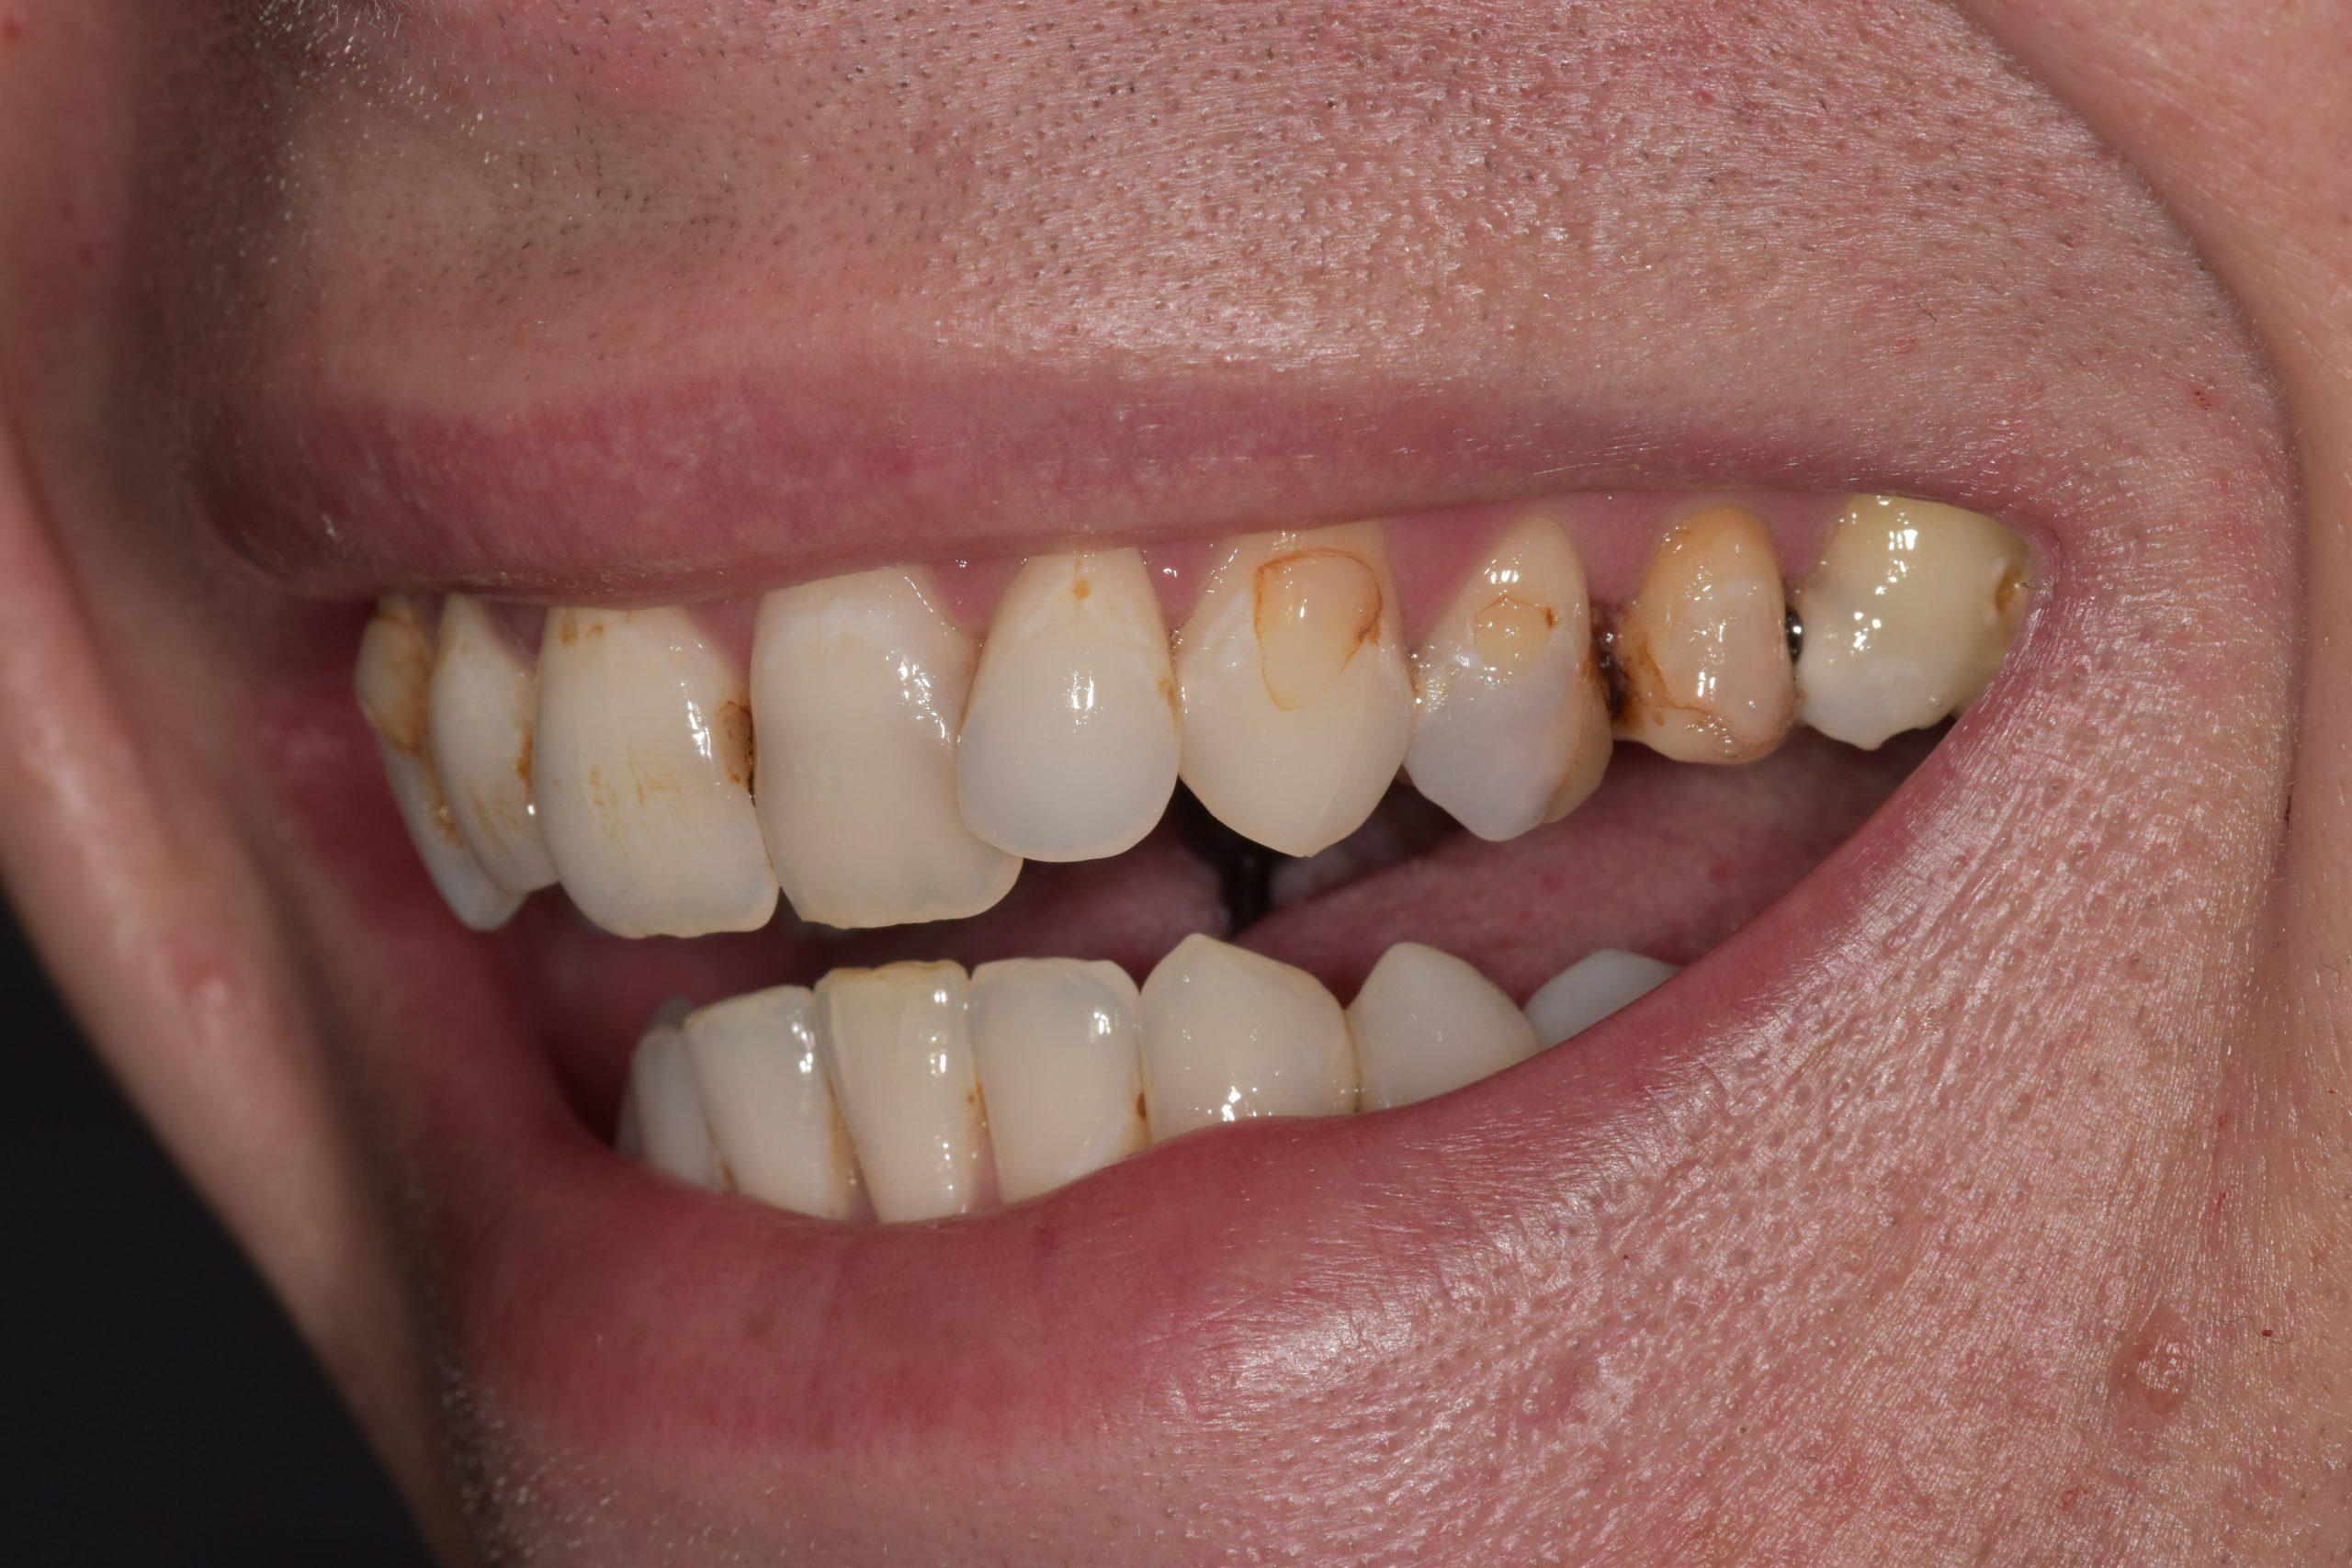 lichfield teeth stain treatment